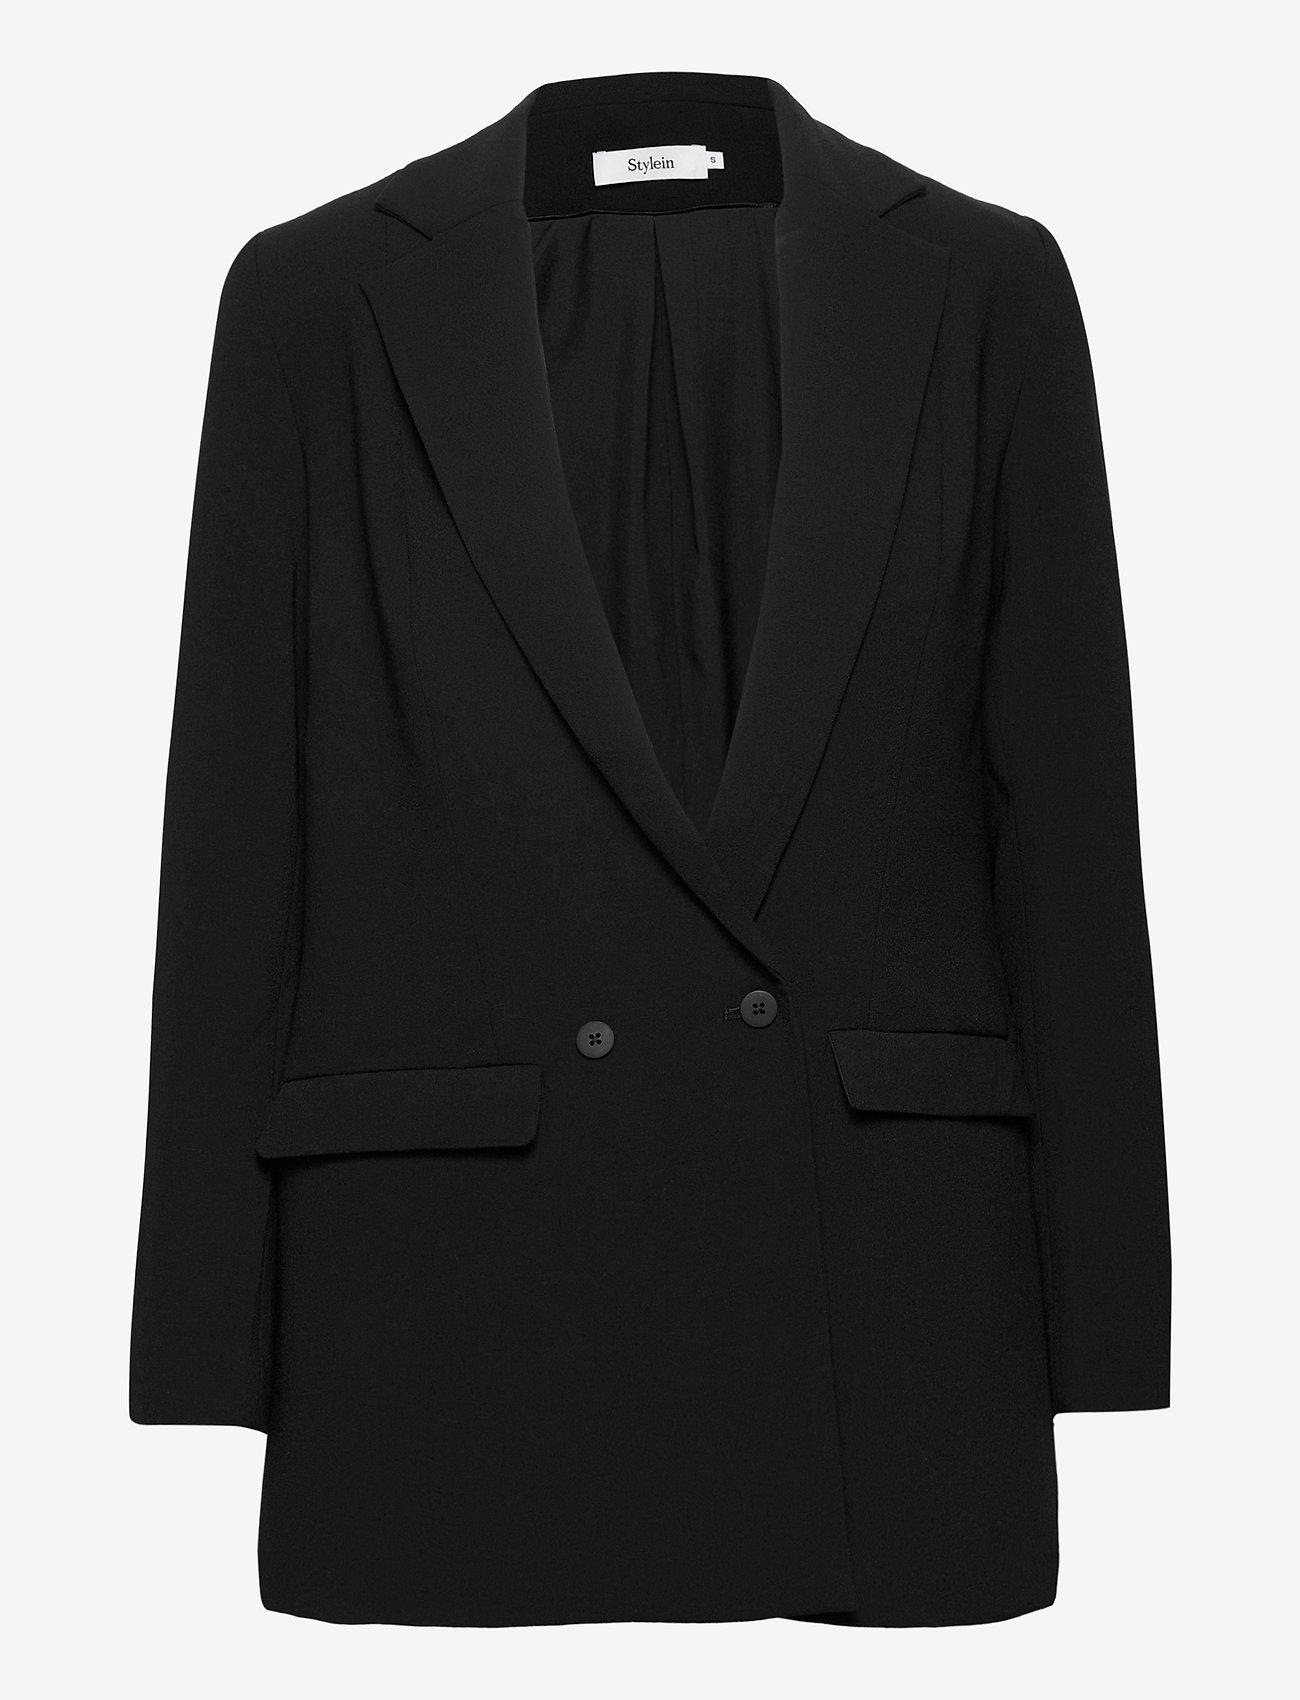 Stylein - BENITO JACKET - oversized blazers - black - 0